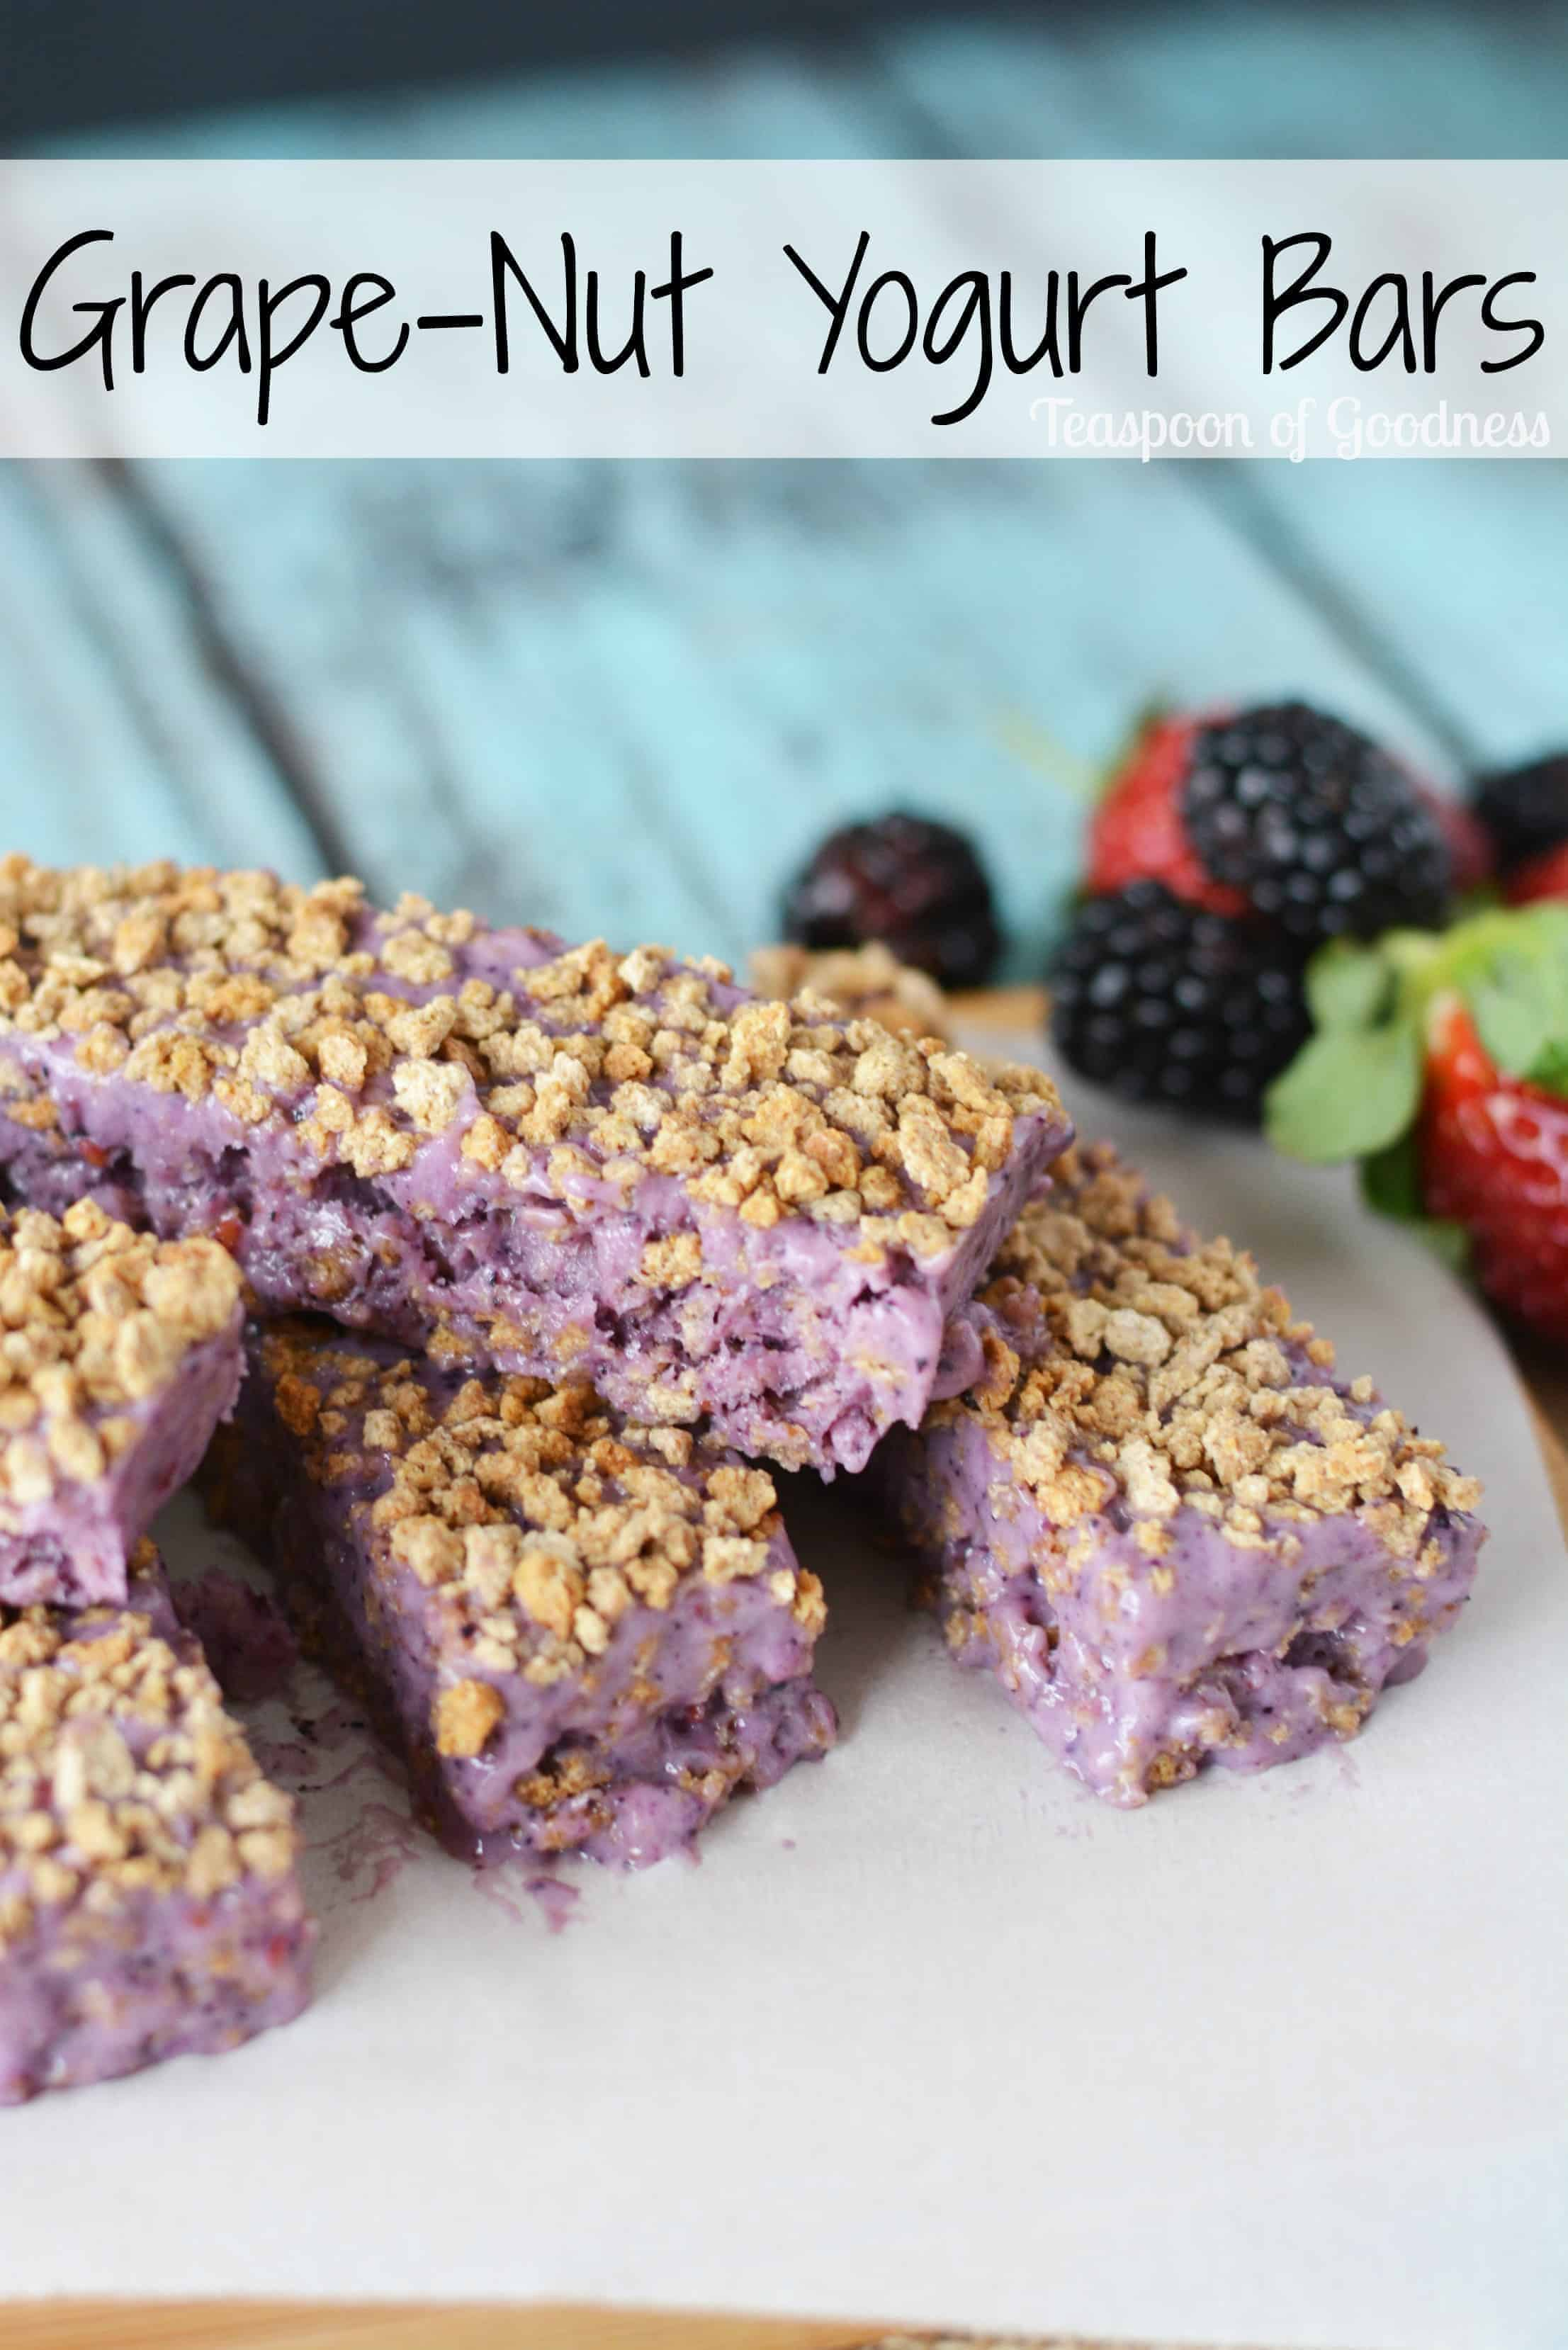 Grape-Nut Yogurt Bar Recipe